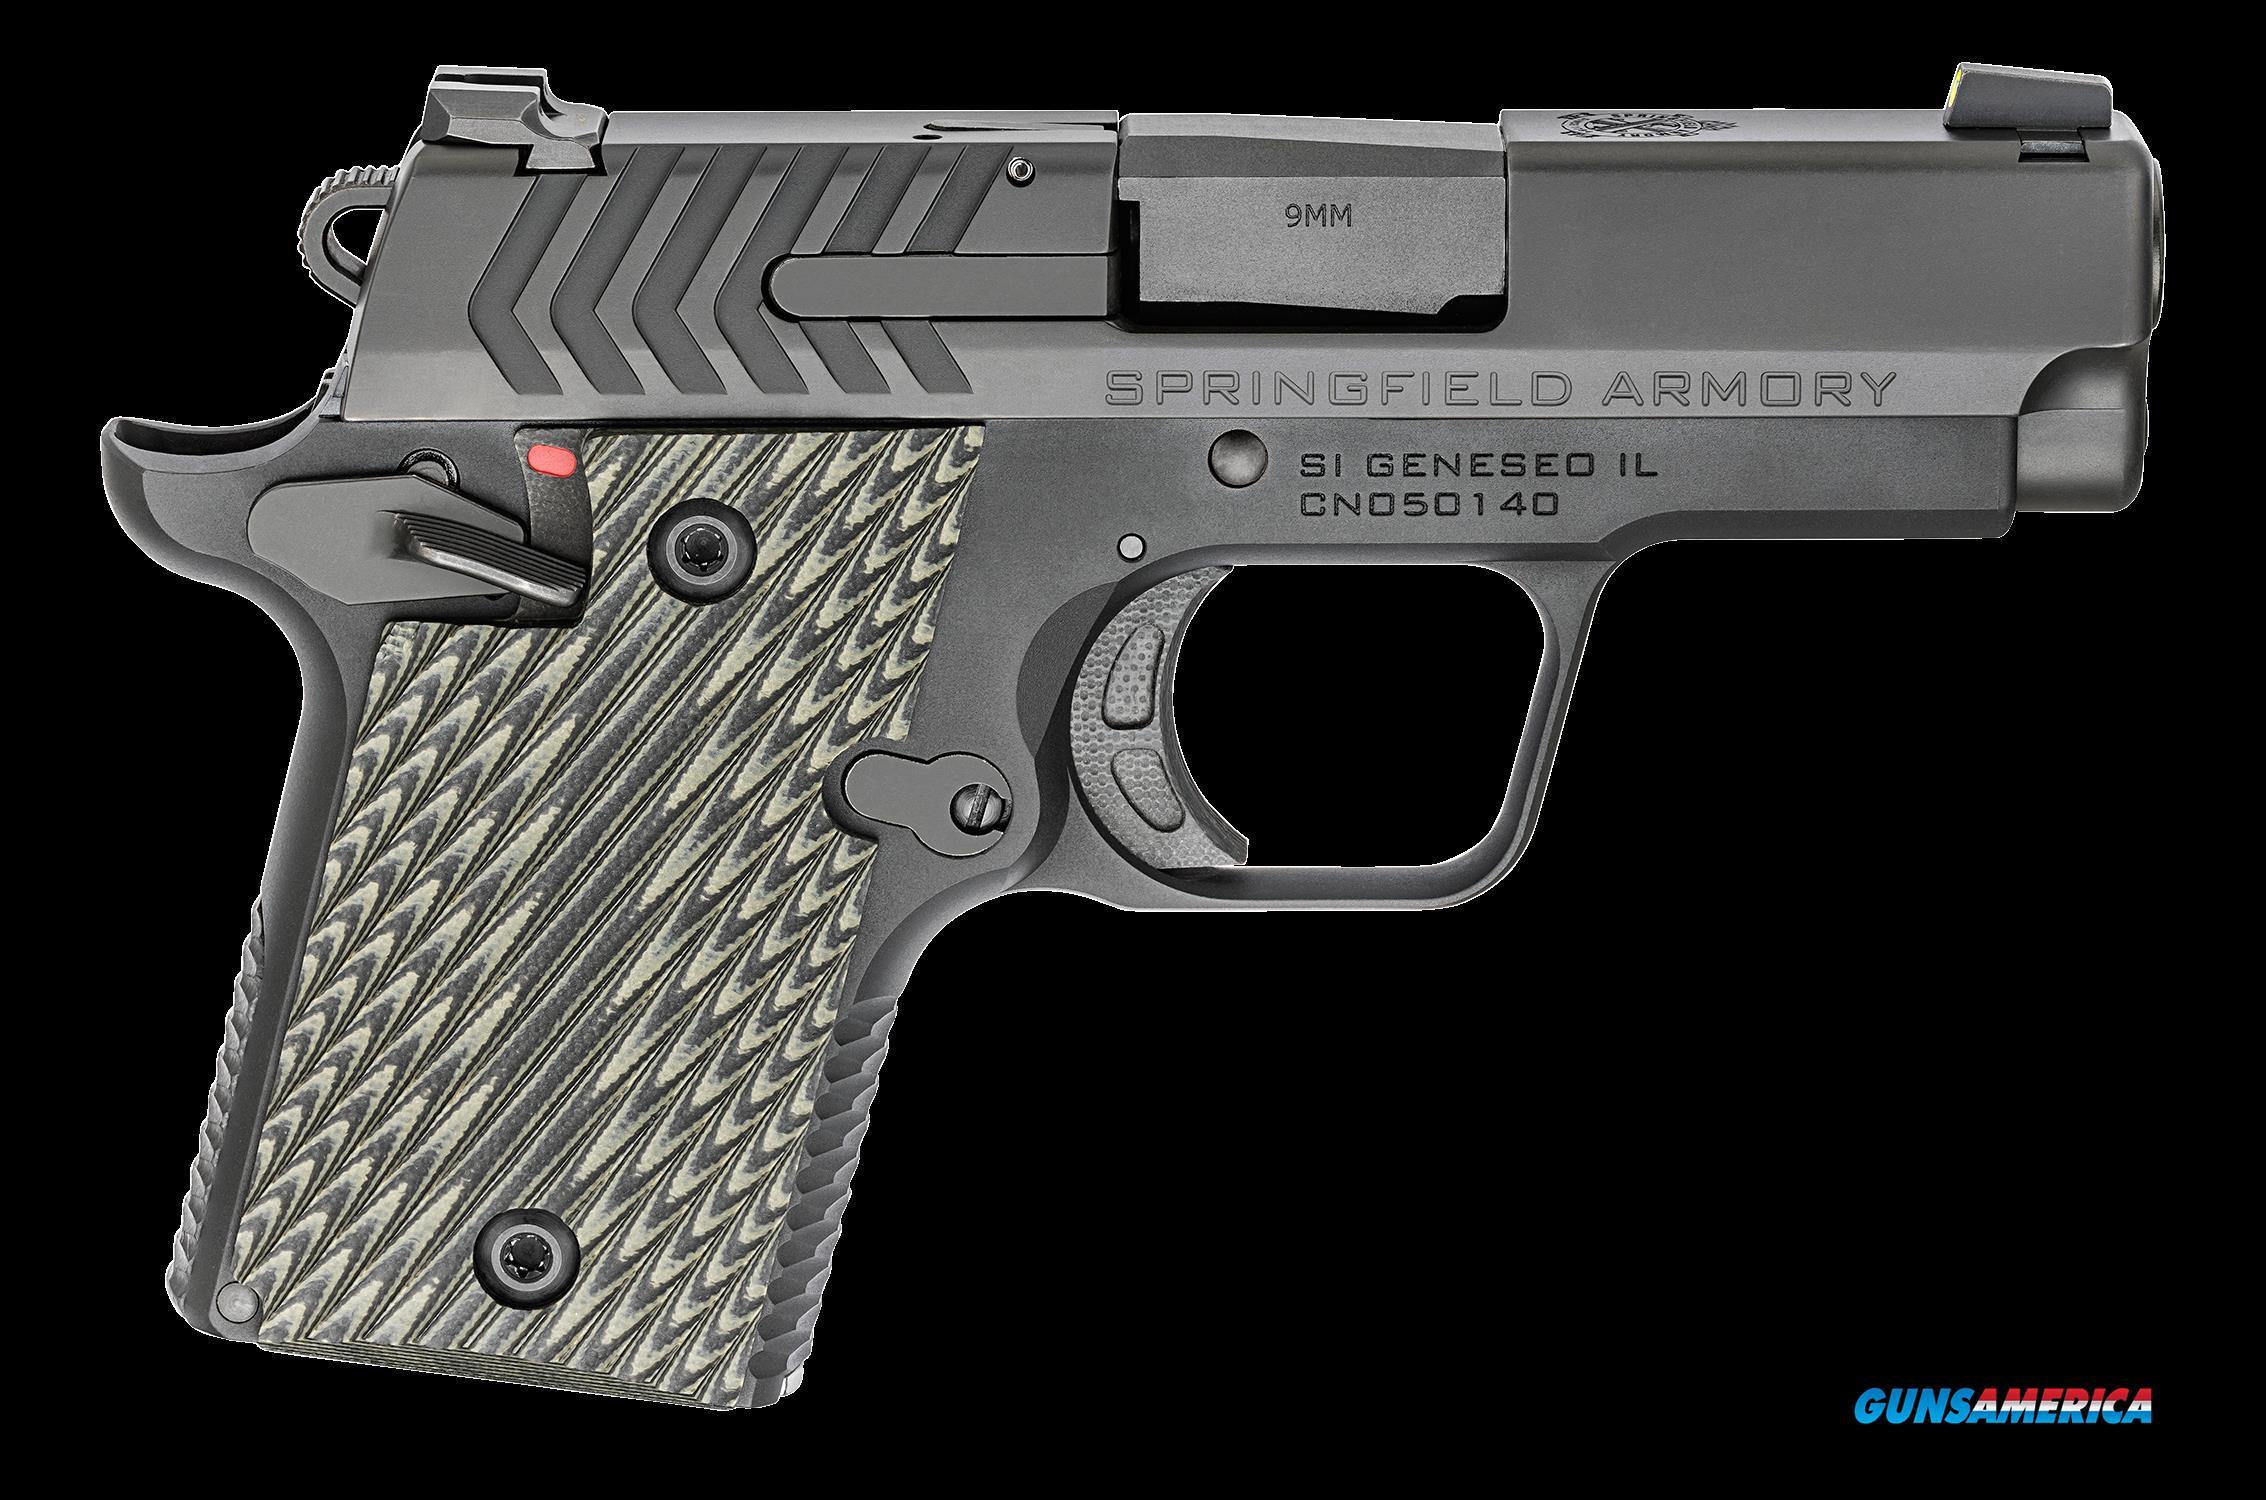 Springfield Armory 911, Spg Pg9119        9mm 911 3in Ntrd      Blk  6-7r  Guns > Pistols > 1911 Pistol Copies (non-Colt)